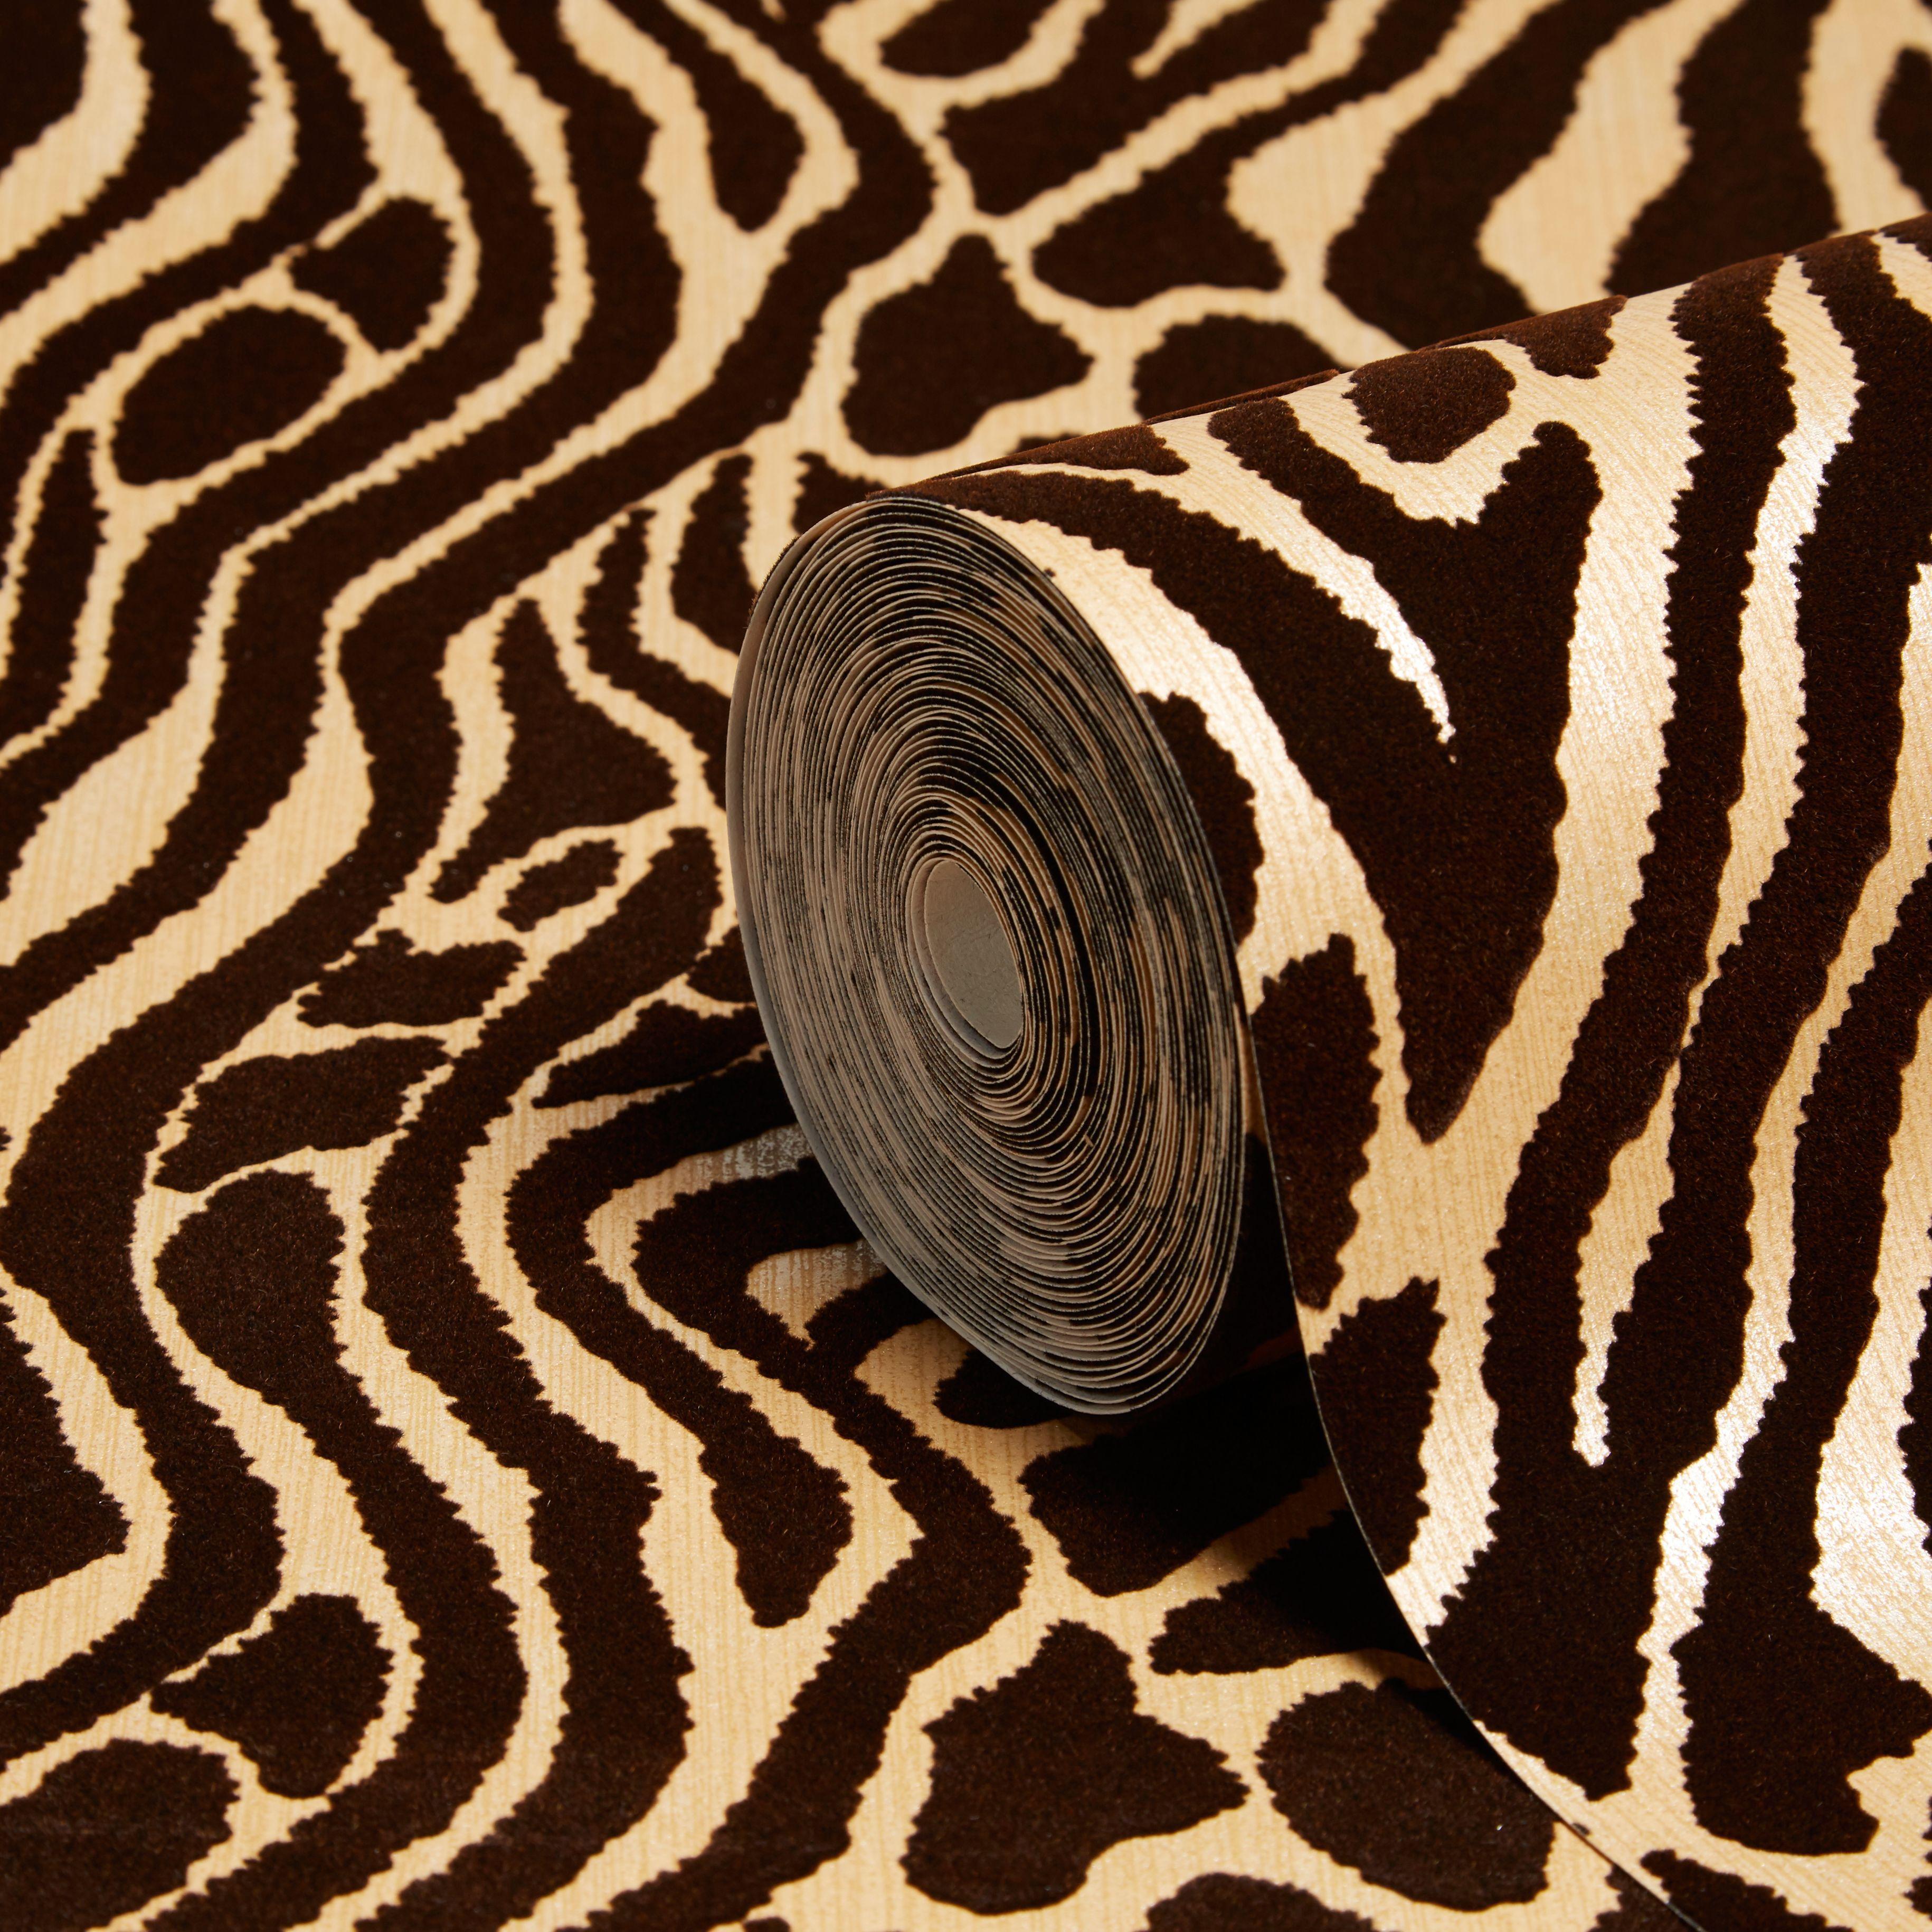 graham u0026 brown julien macdonald caffe gold animal print wallpaper